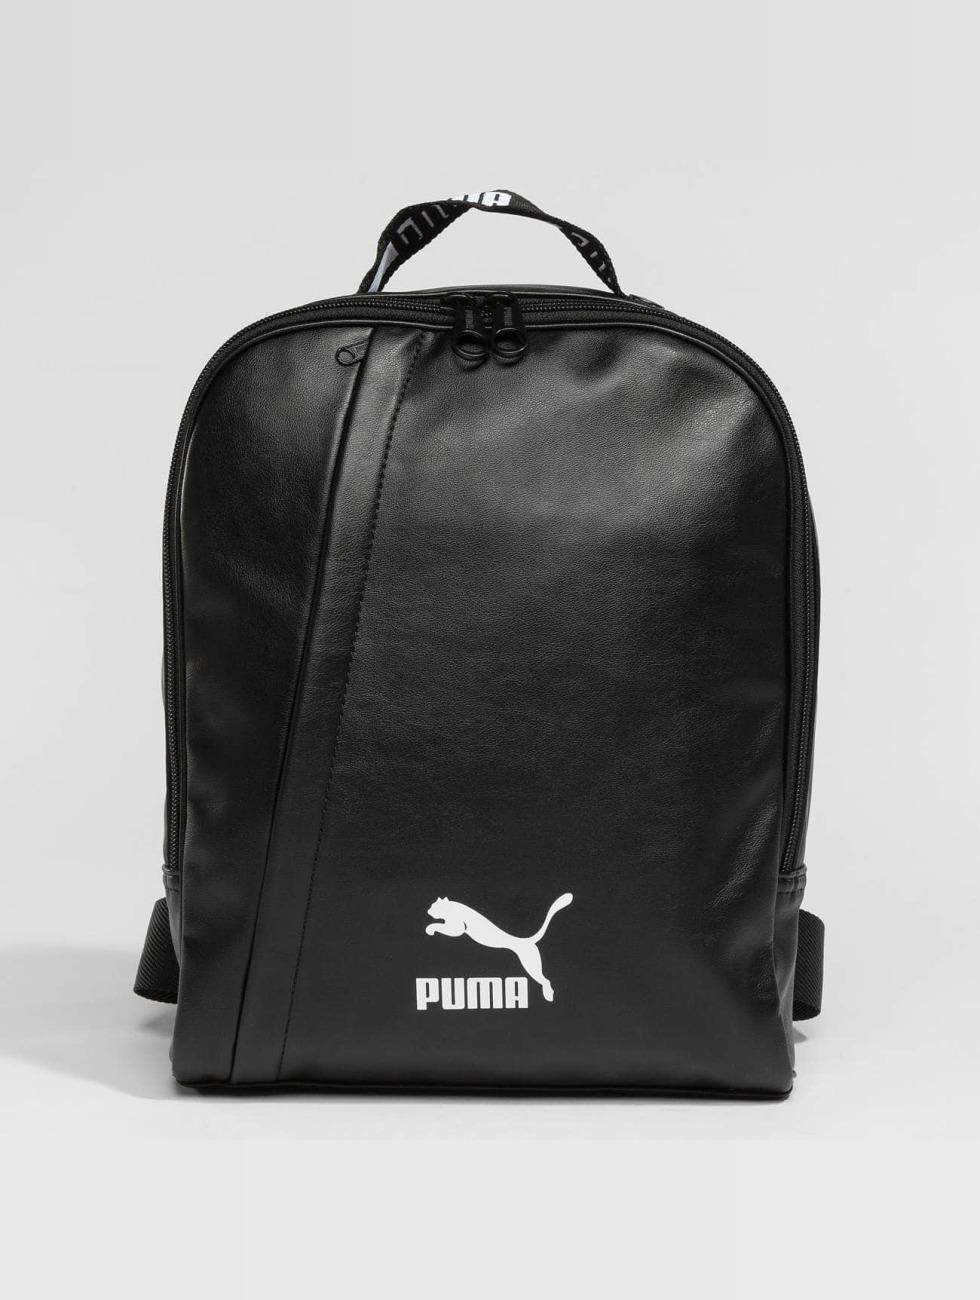 Puma rugzak Prime Icon zwart